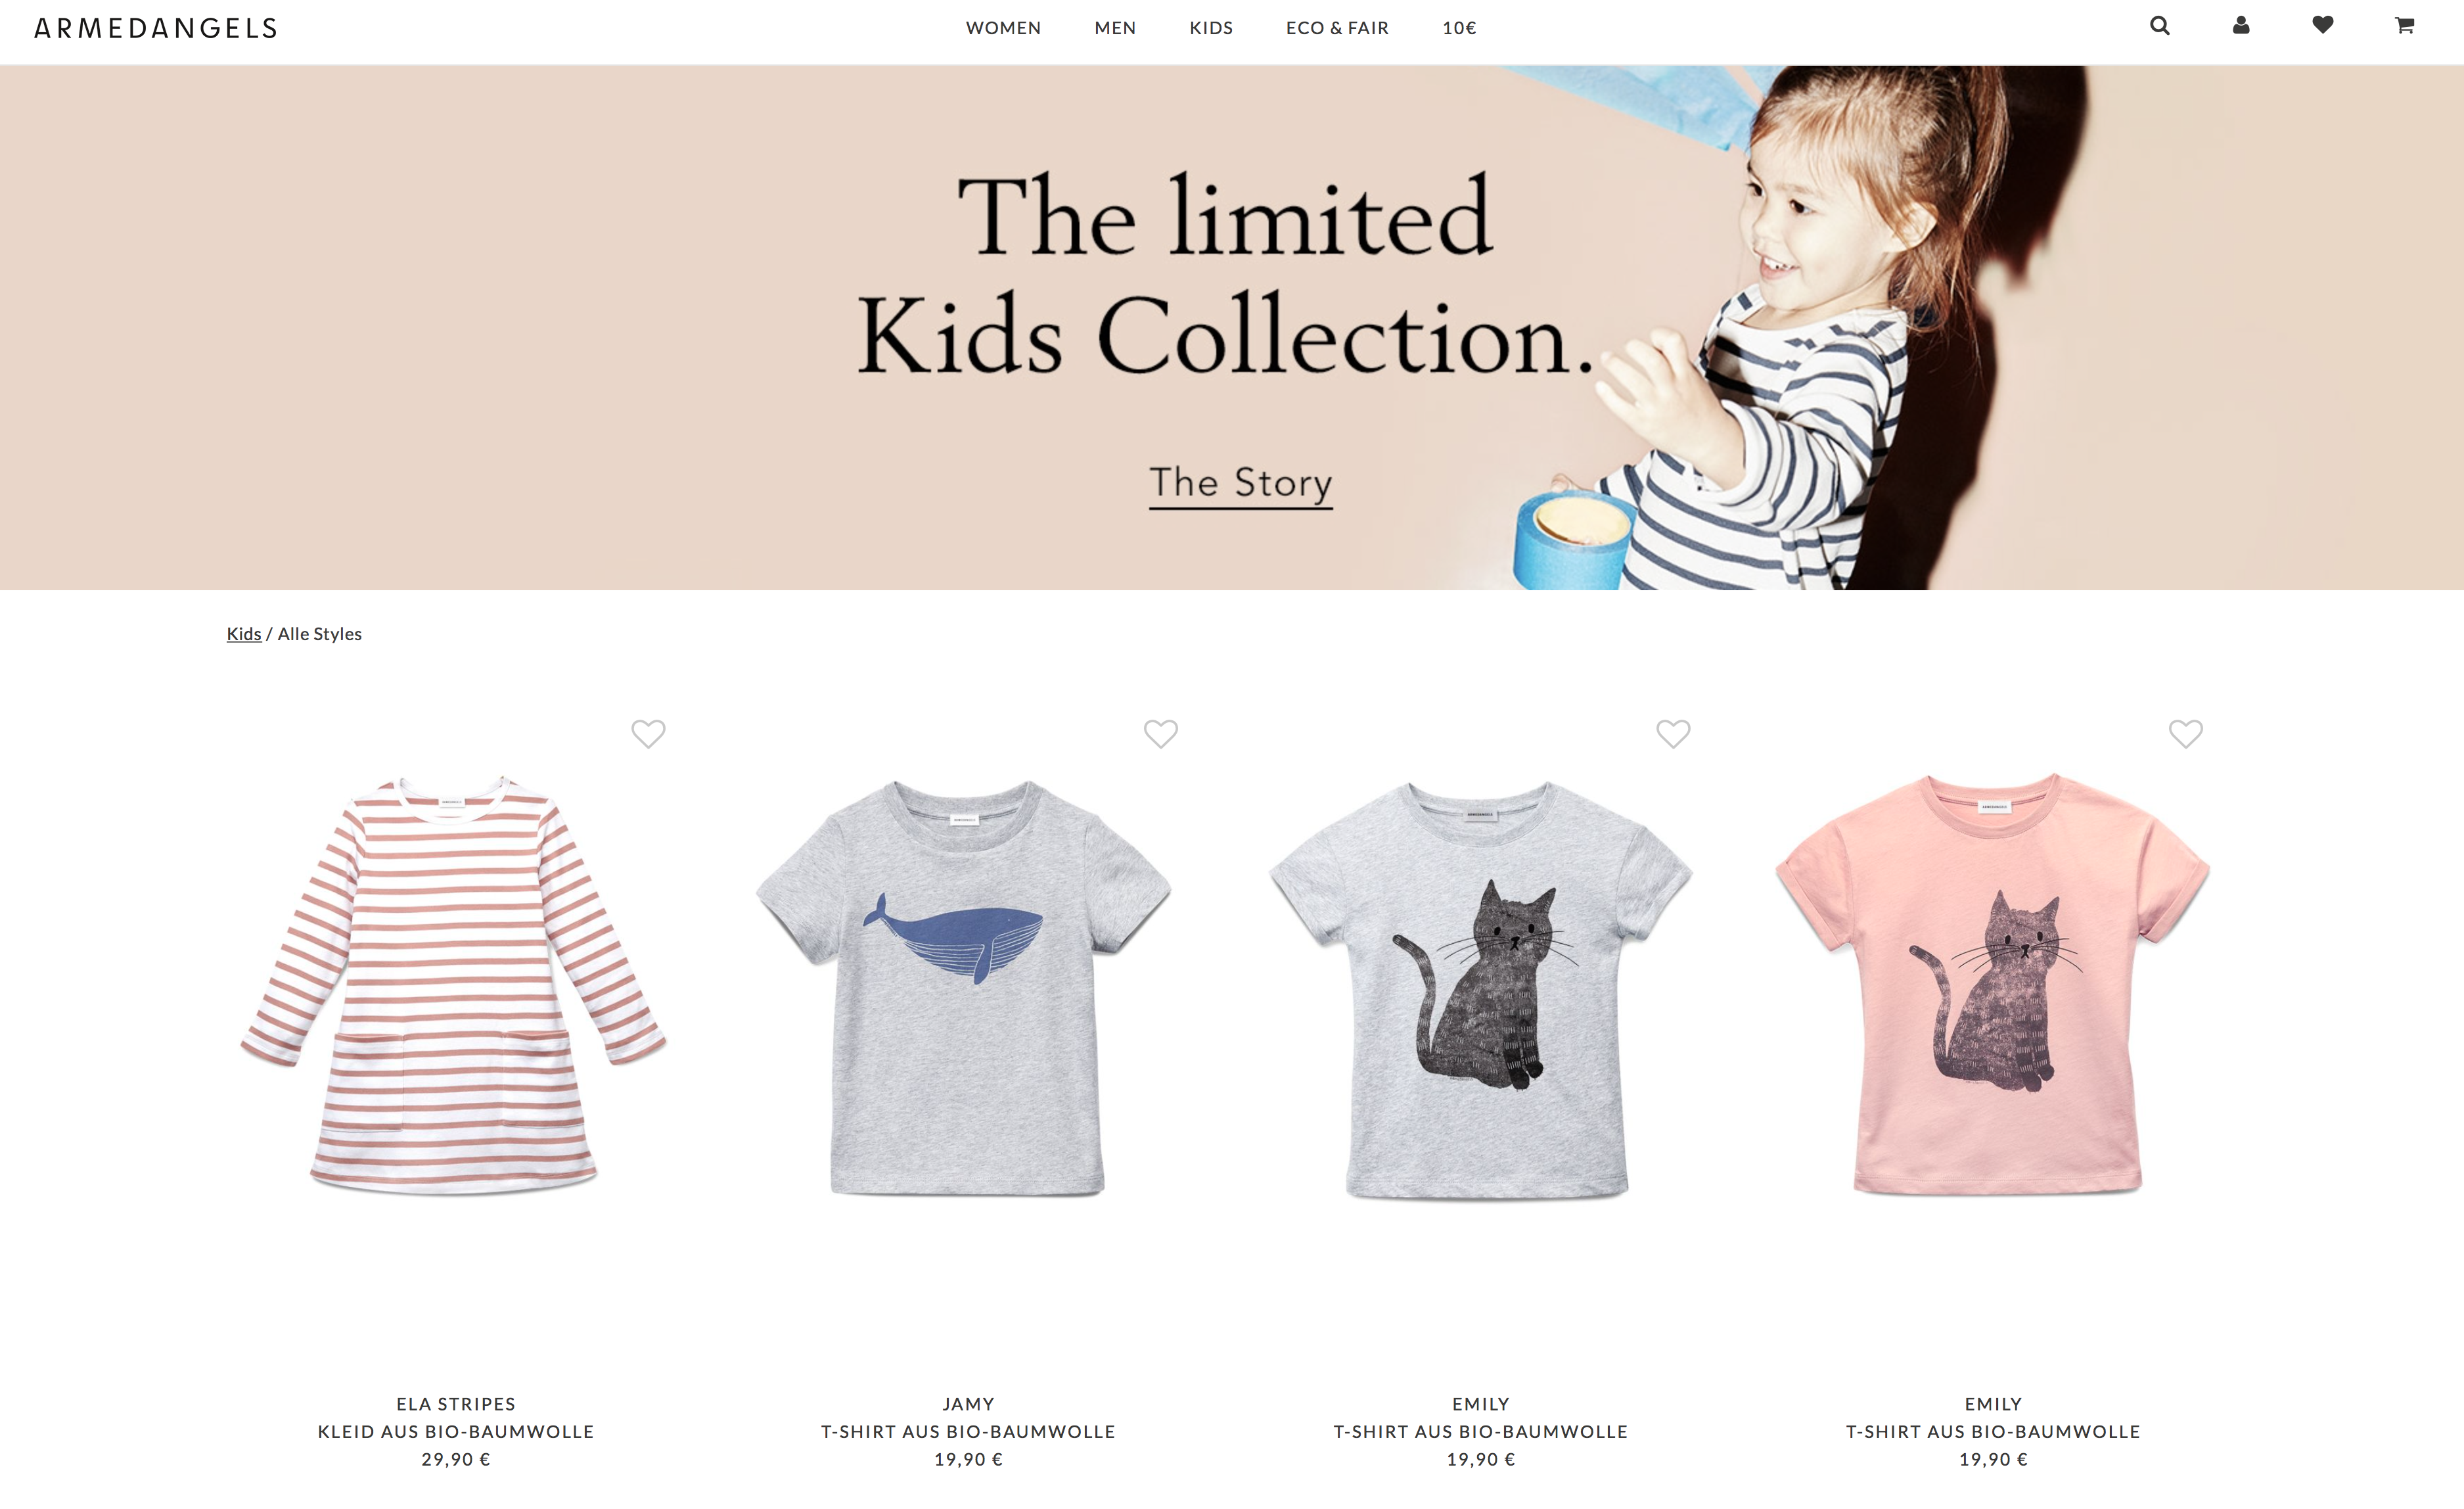 armedangels nachhaltige Kinderkleidung